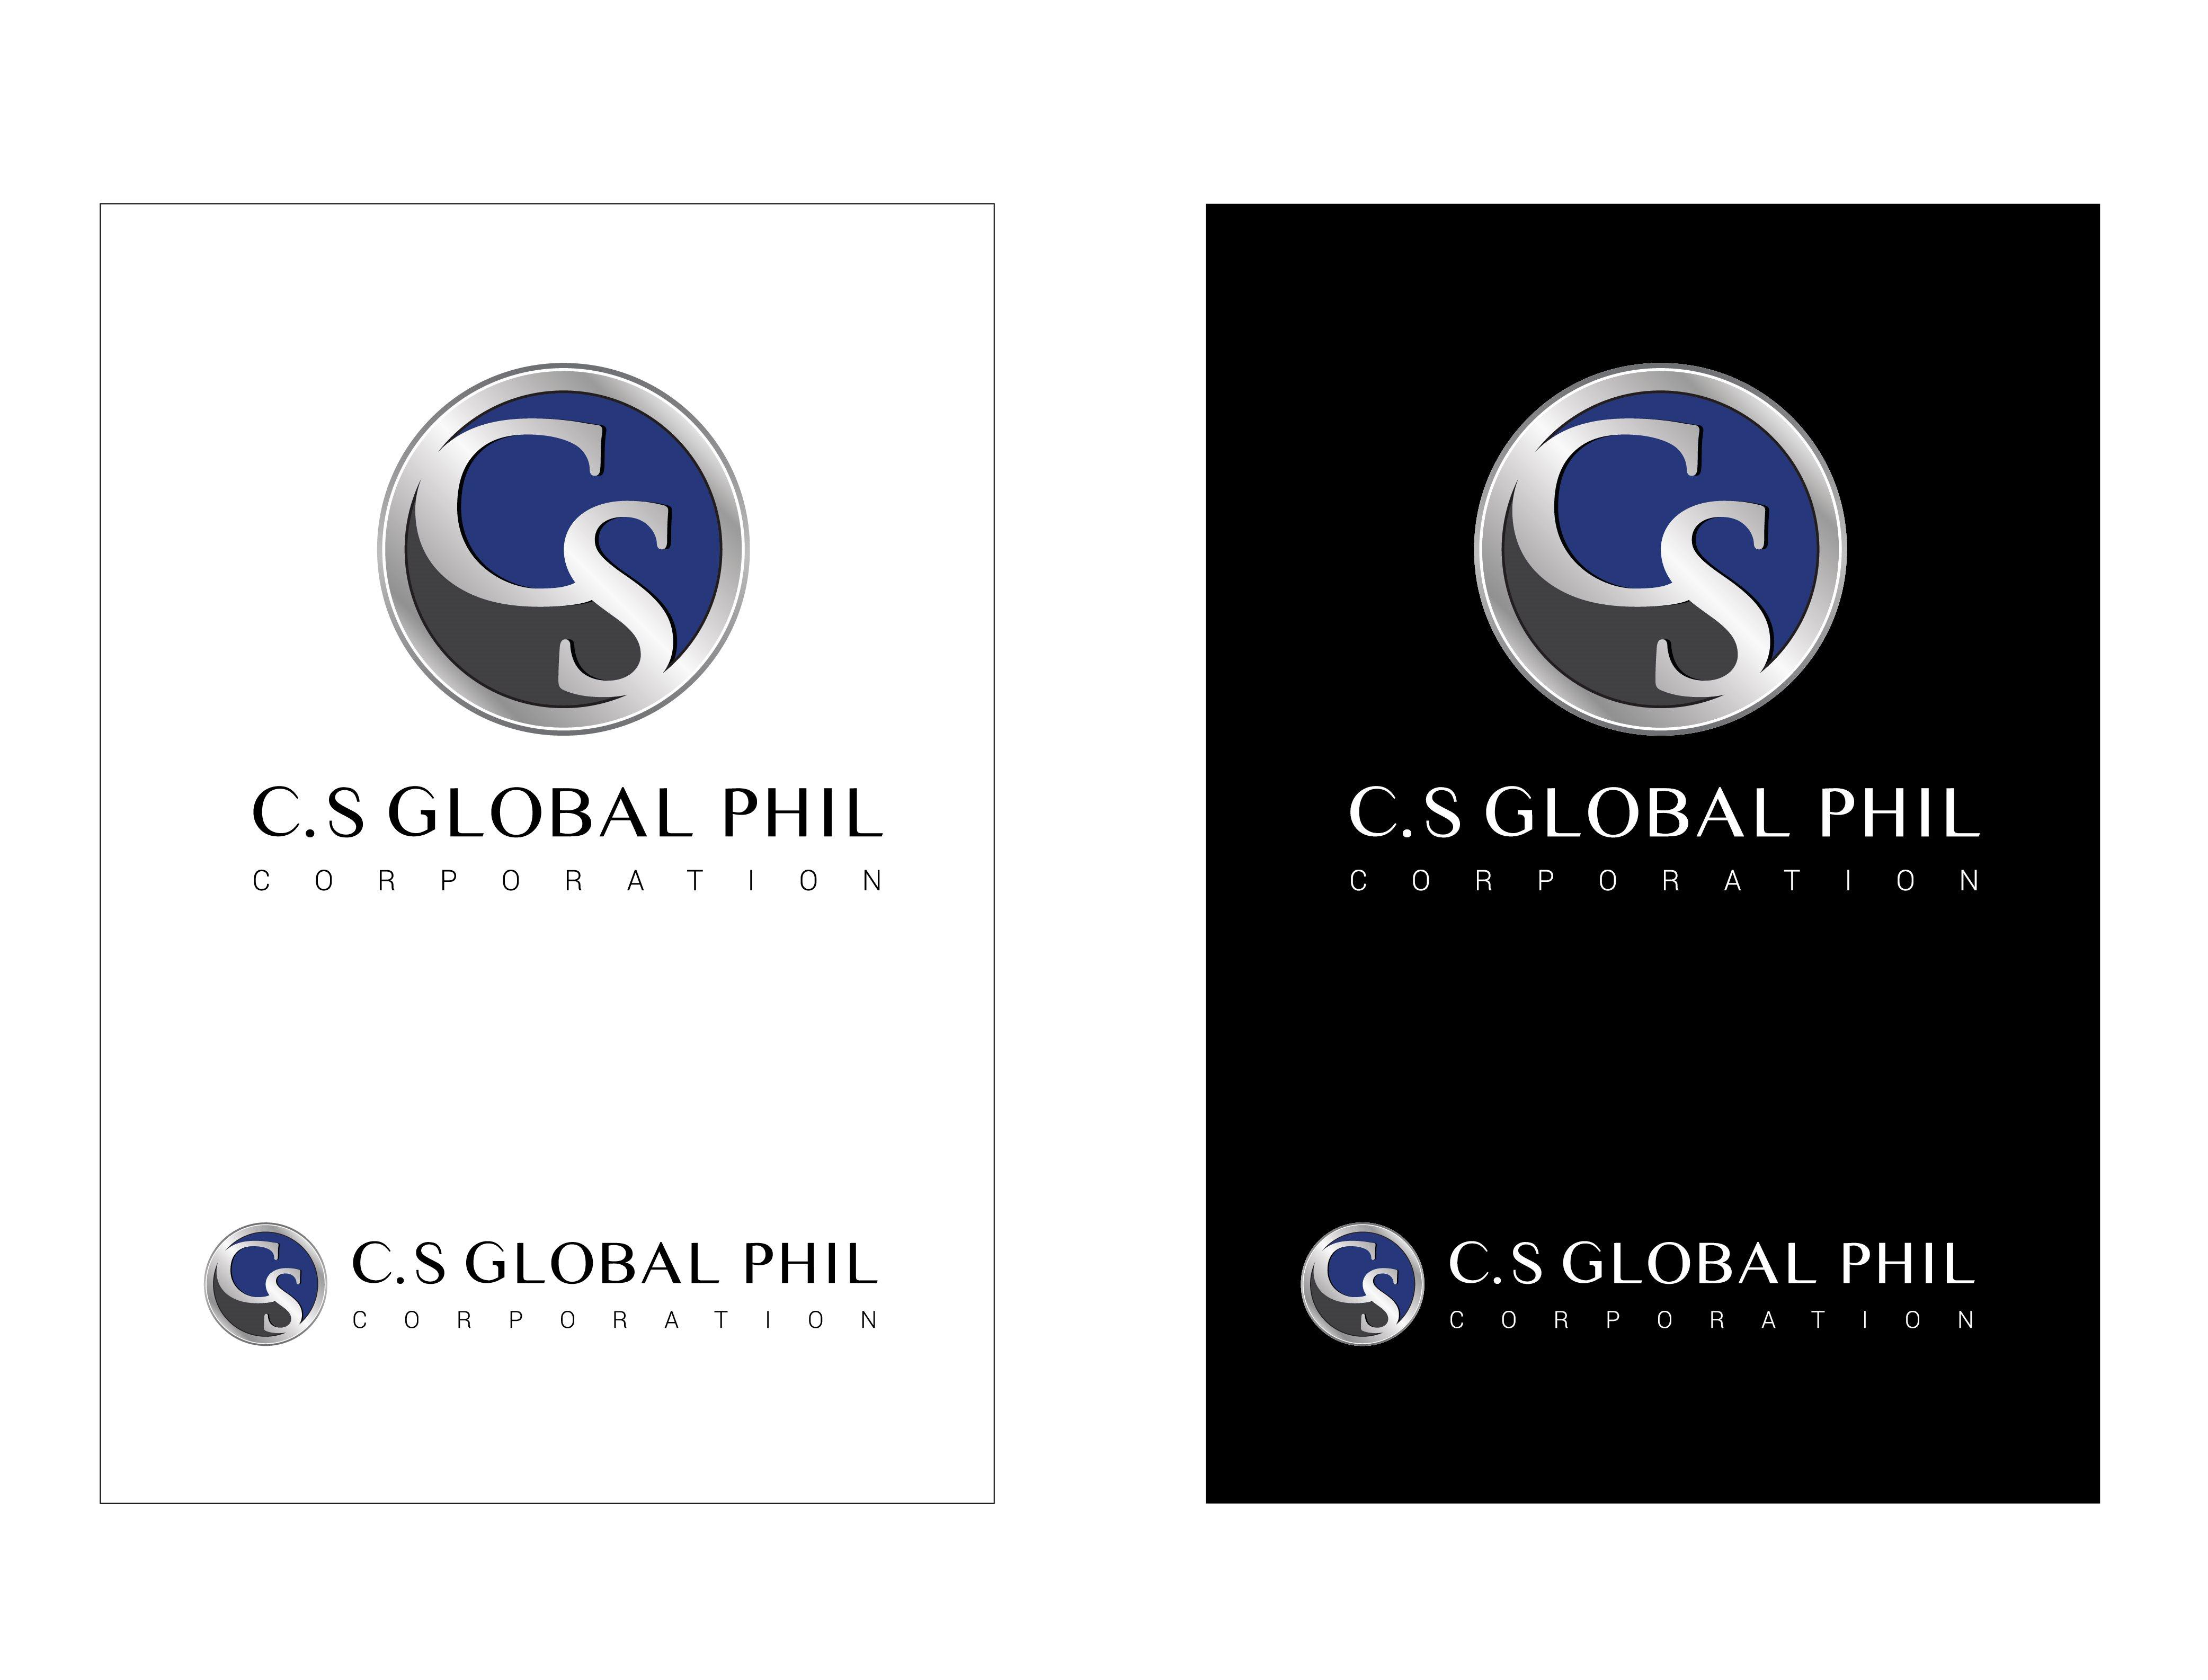 C.S. Global Phil. Corporation